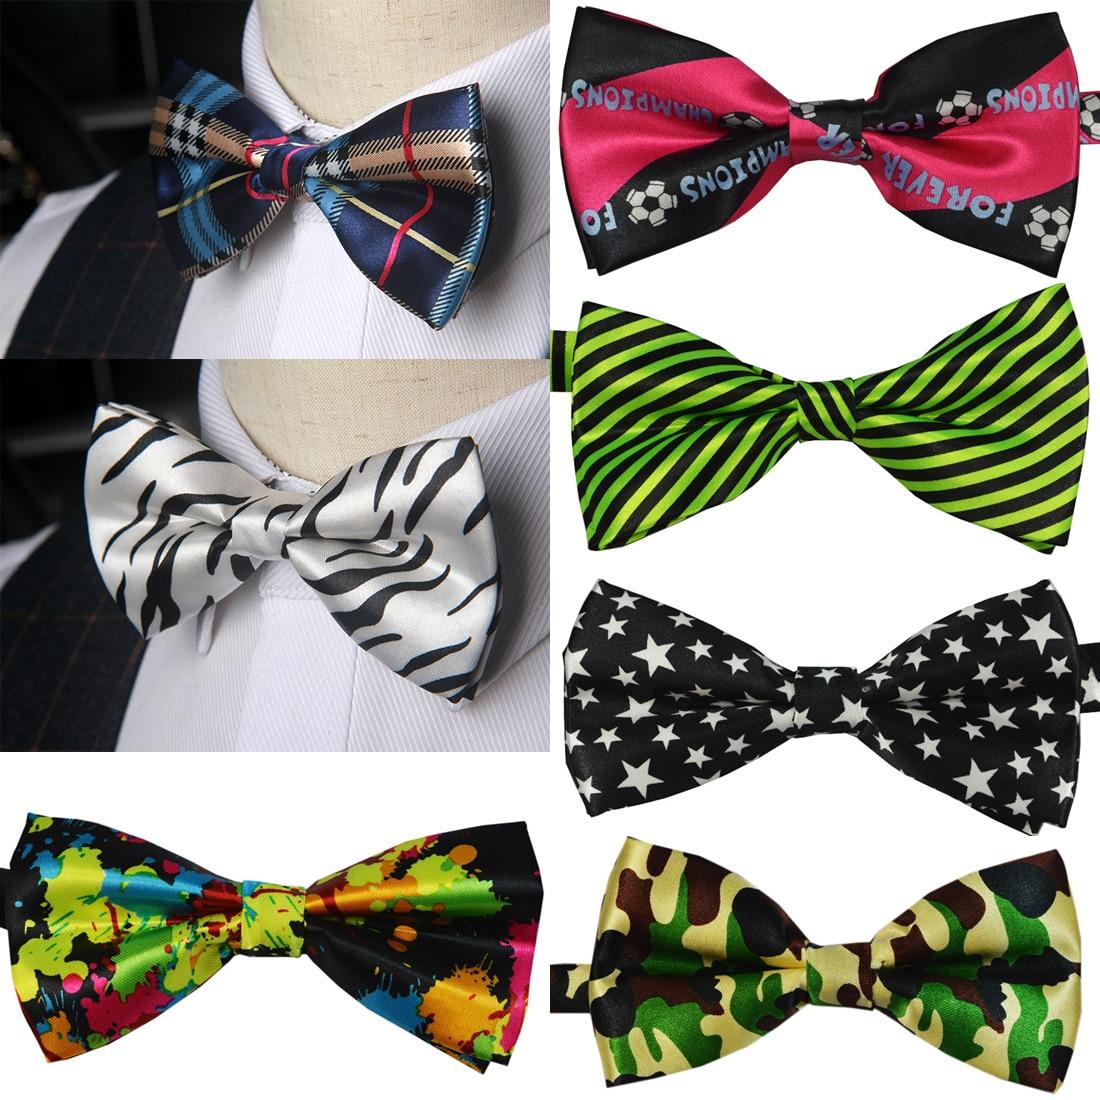 Sale 1PC Gentleman Men Classic Satin Bowtie Necktie For Wedding Party Adjustable Bow tie knot